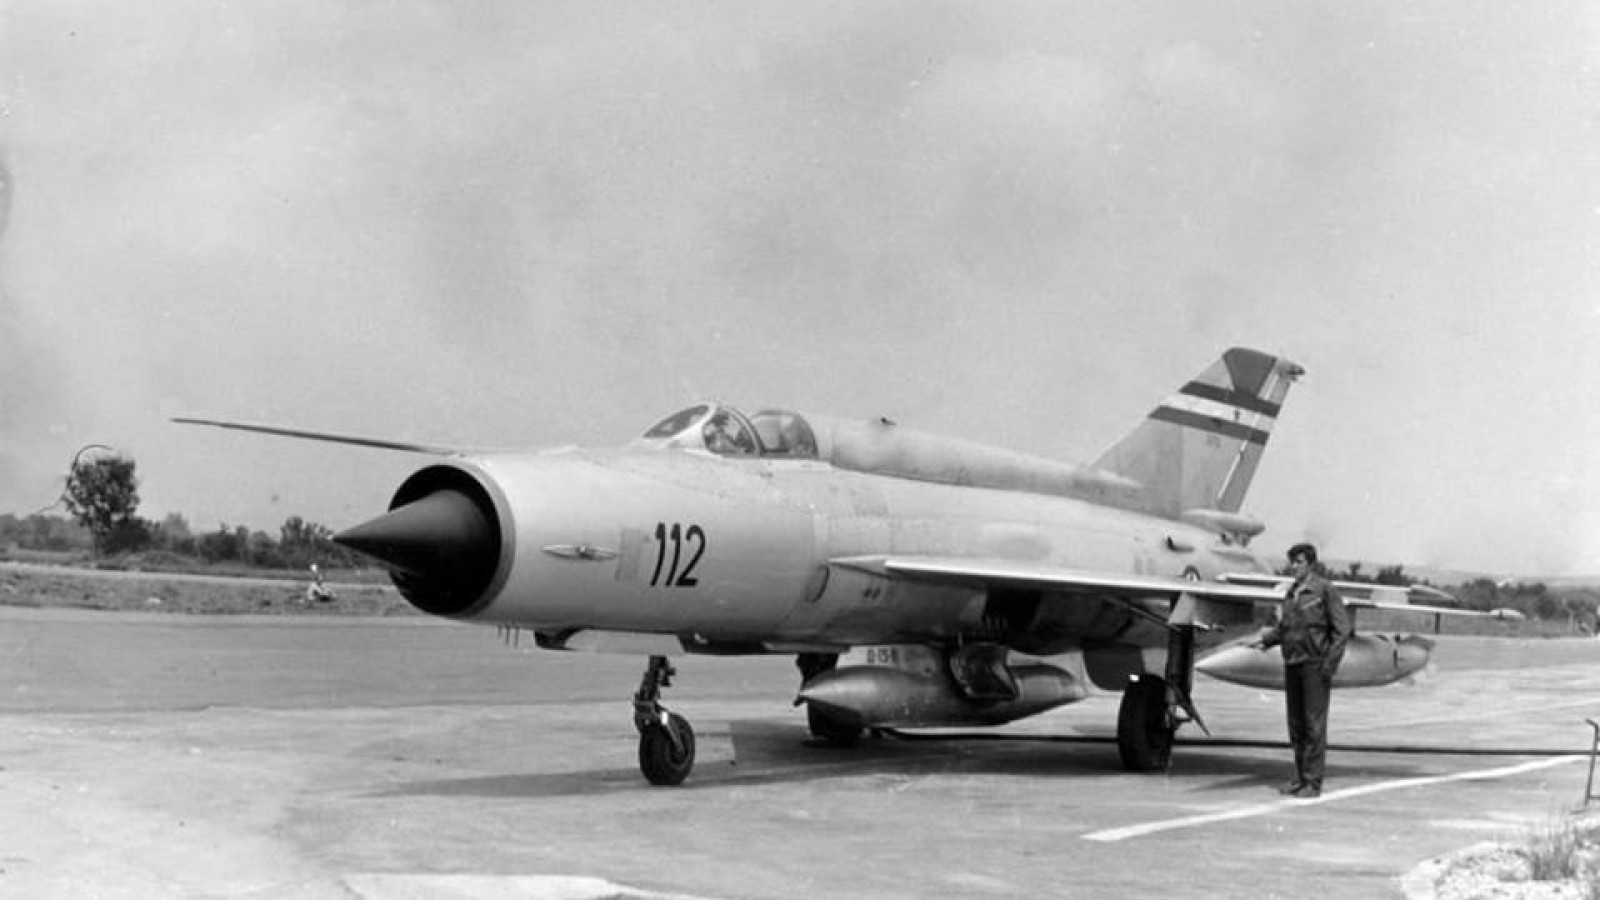 Letačke priče Suada Hamzića: Otkaz Aru-3v